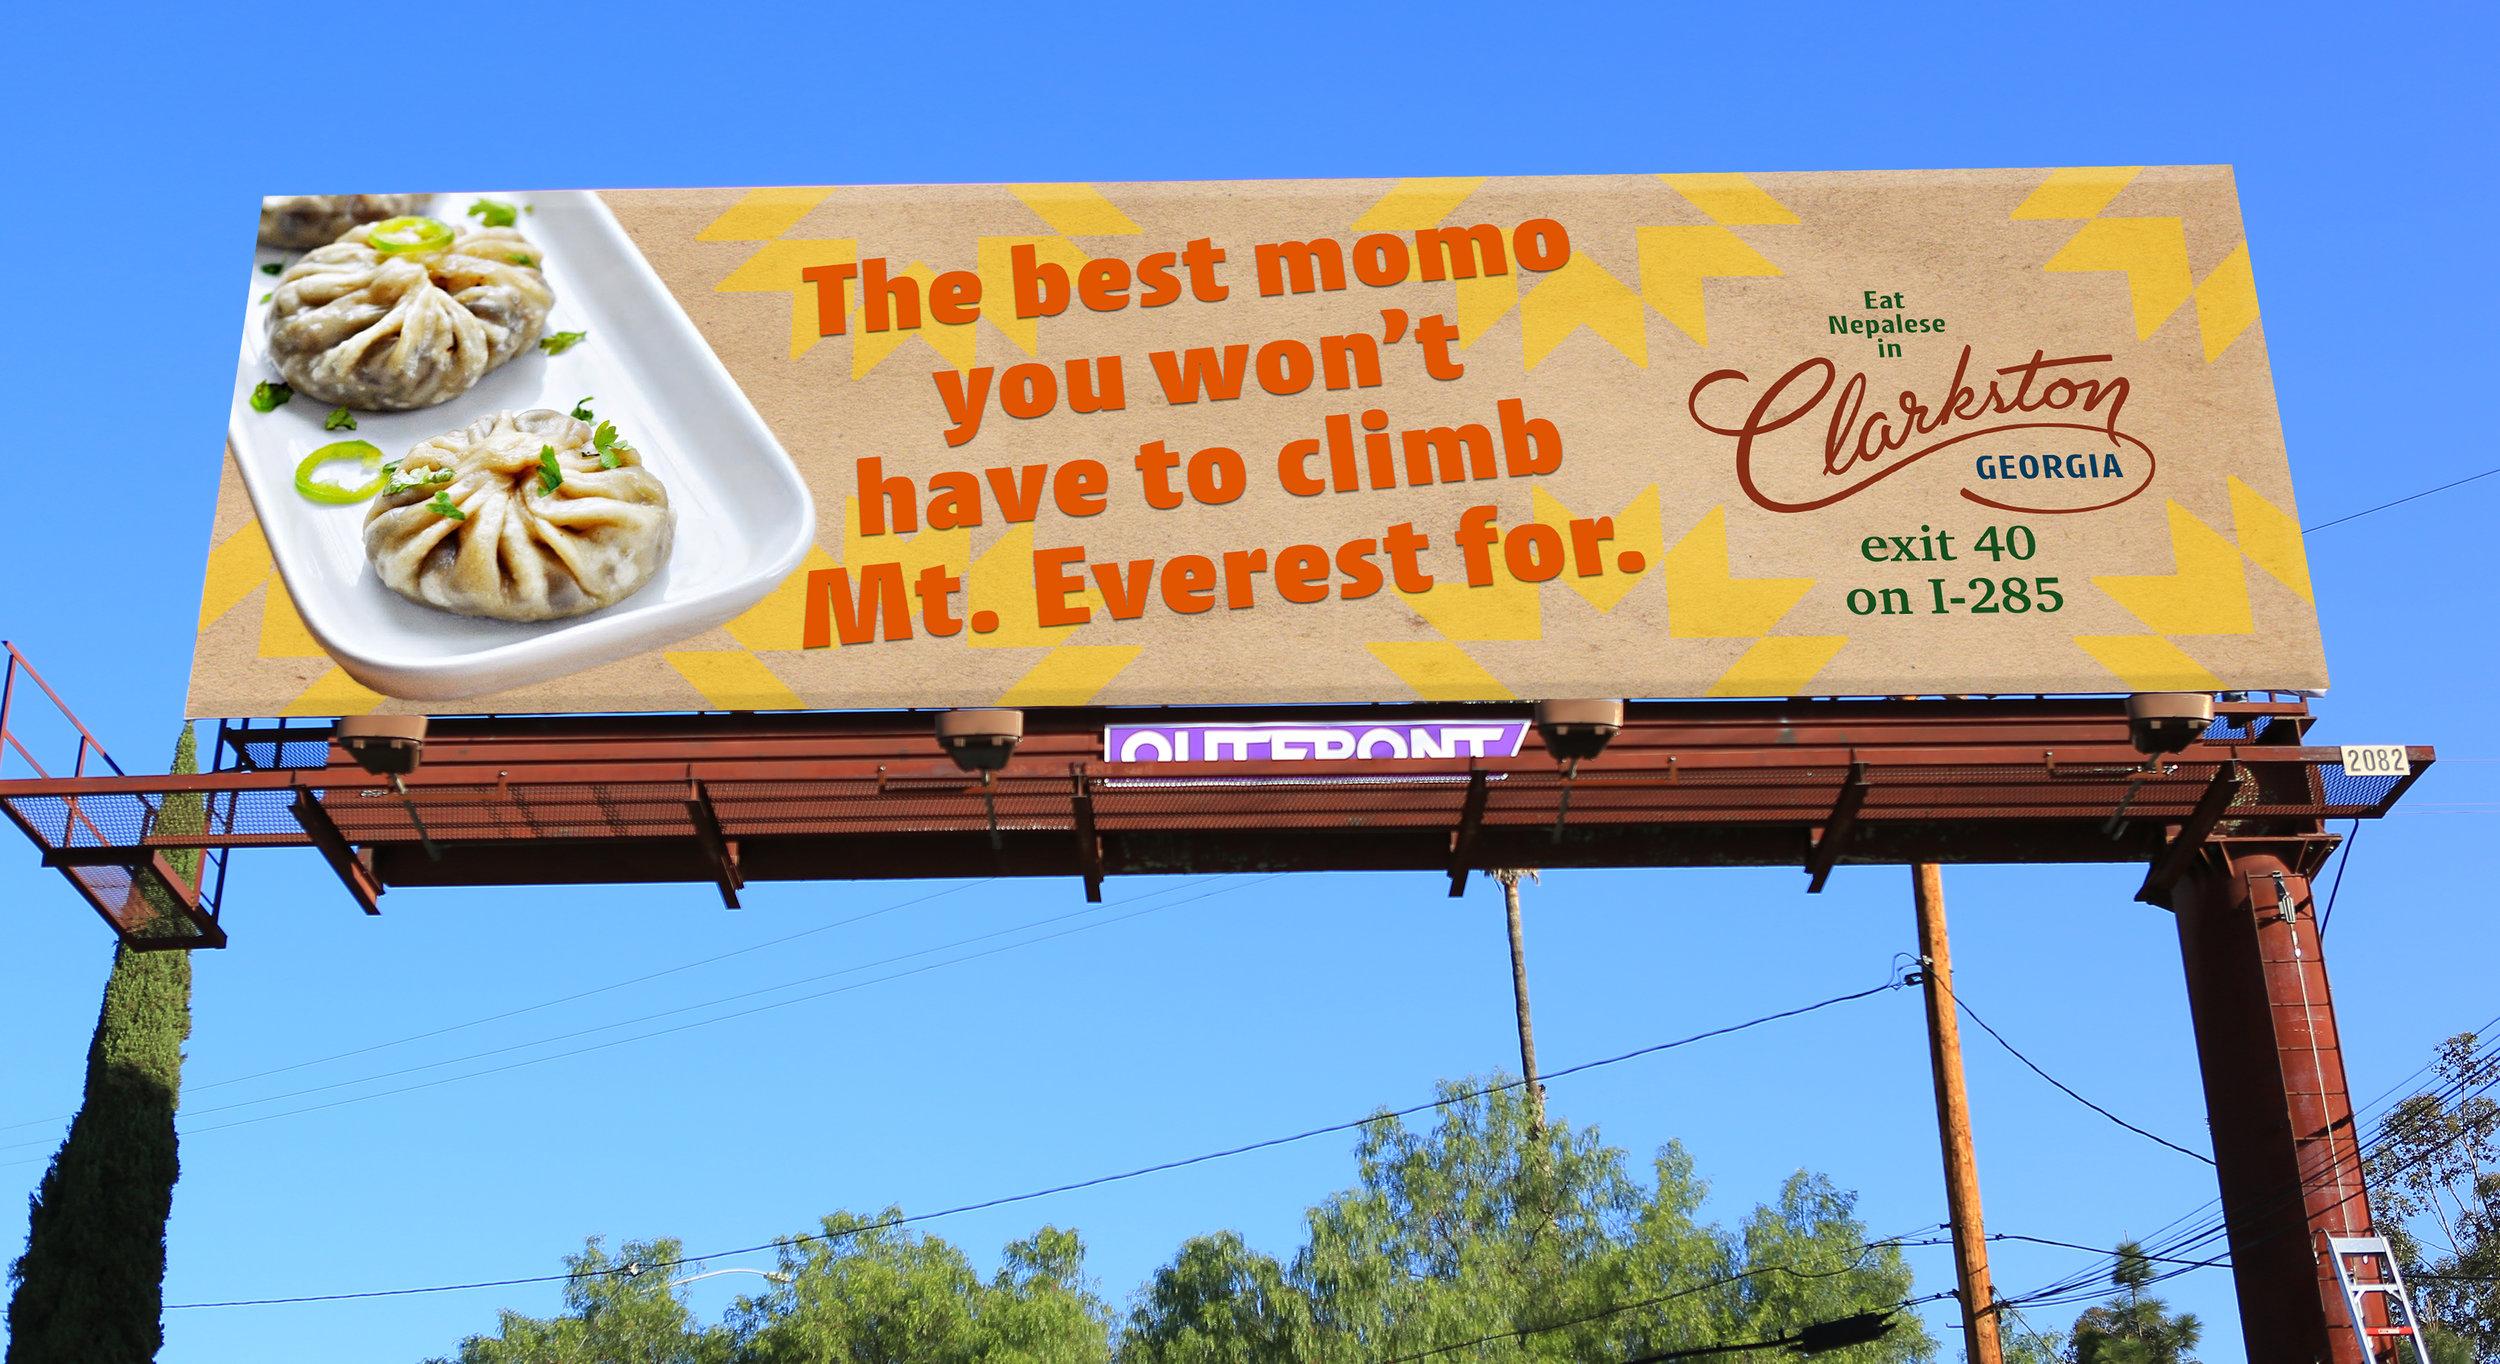 billboard mockup 2 (3).jpg